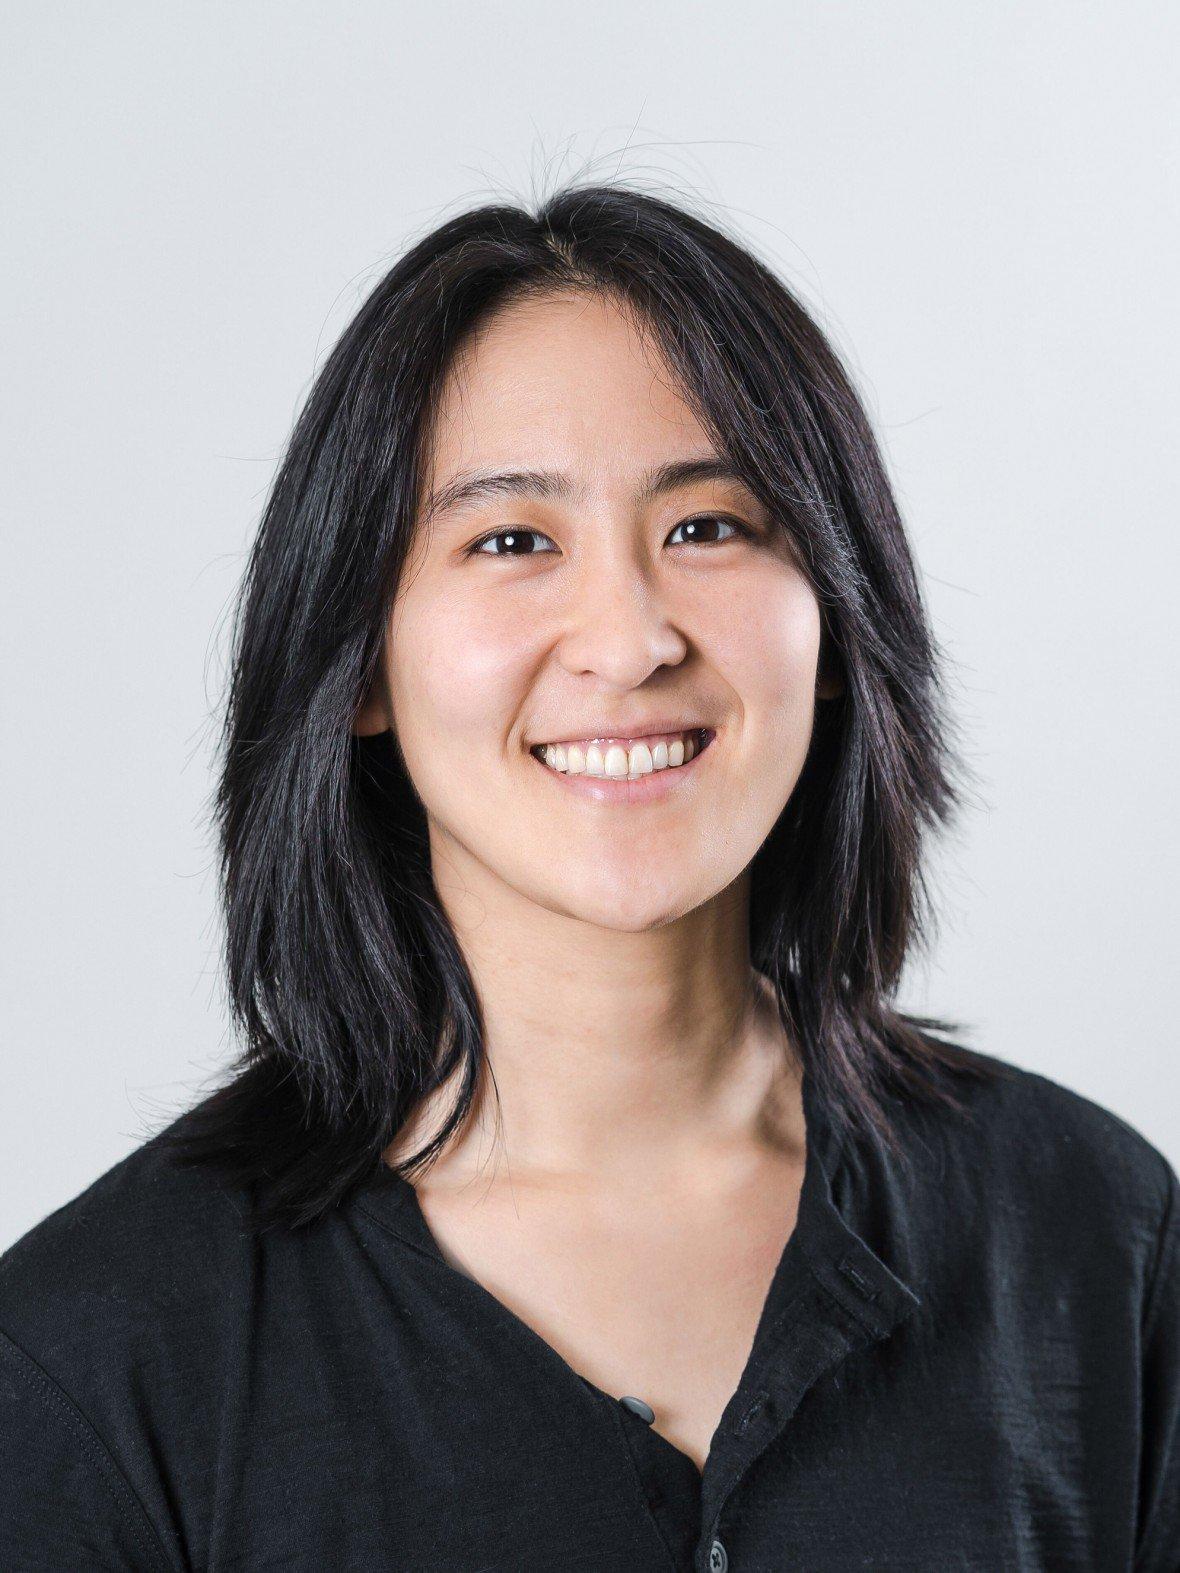 Photo of Vivian Chu